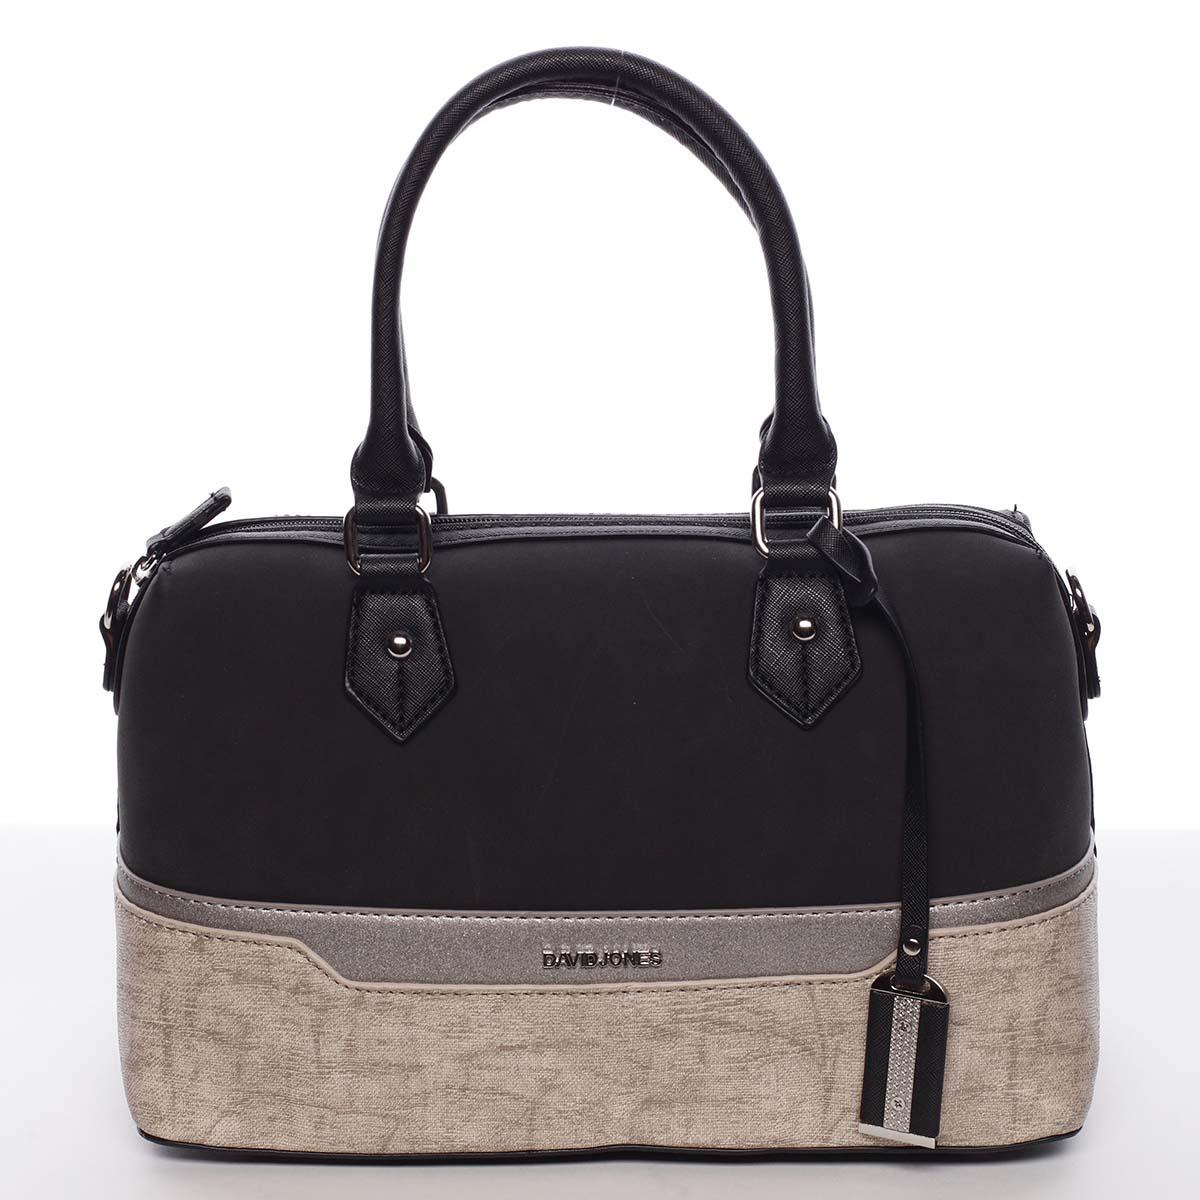 Elegantná a módna čierna dámska kabelka do ruky - David Jones Lizz čierna